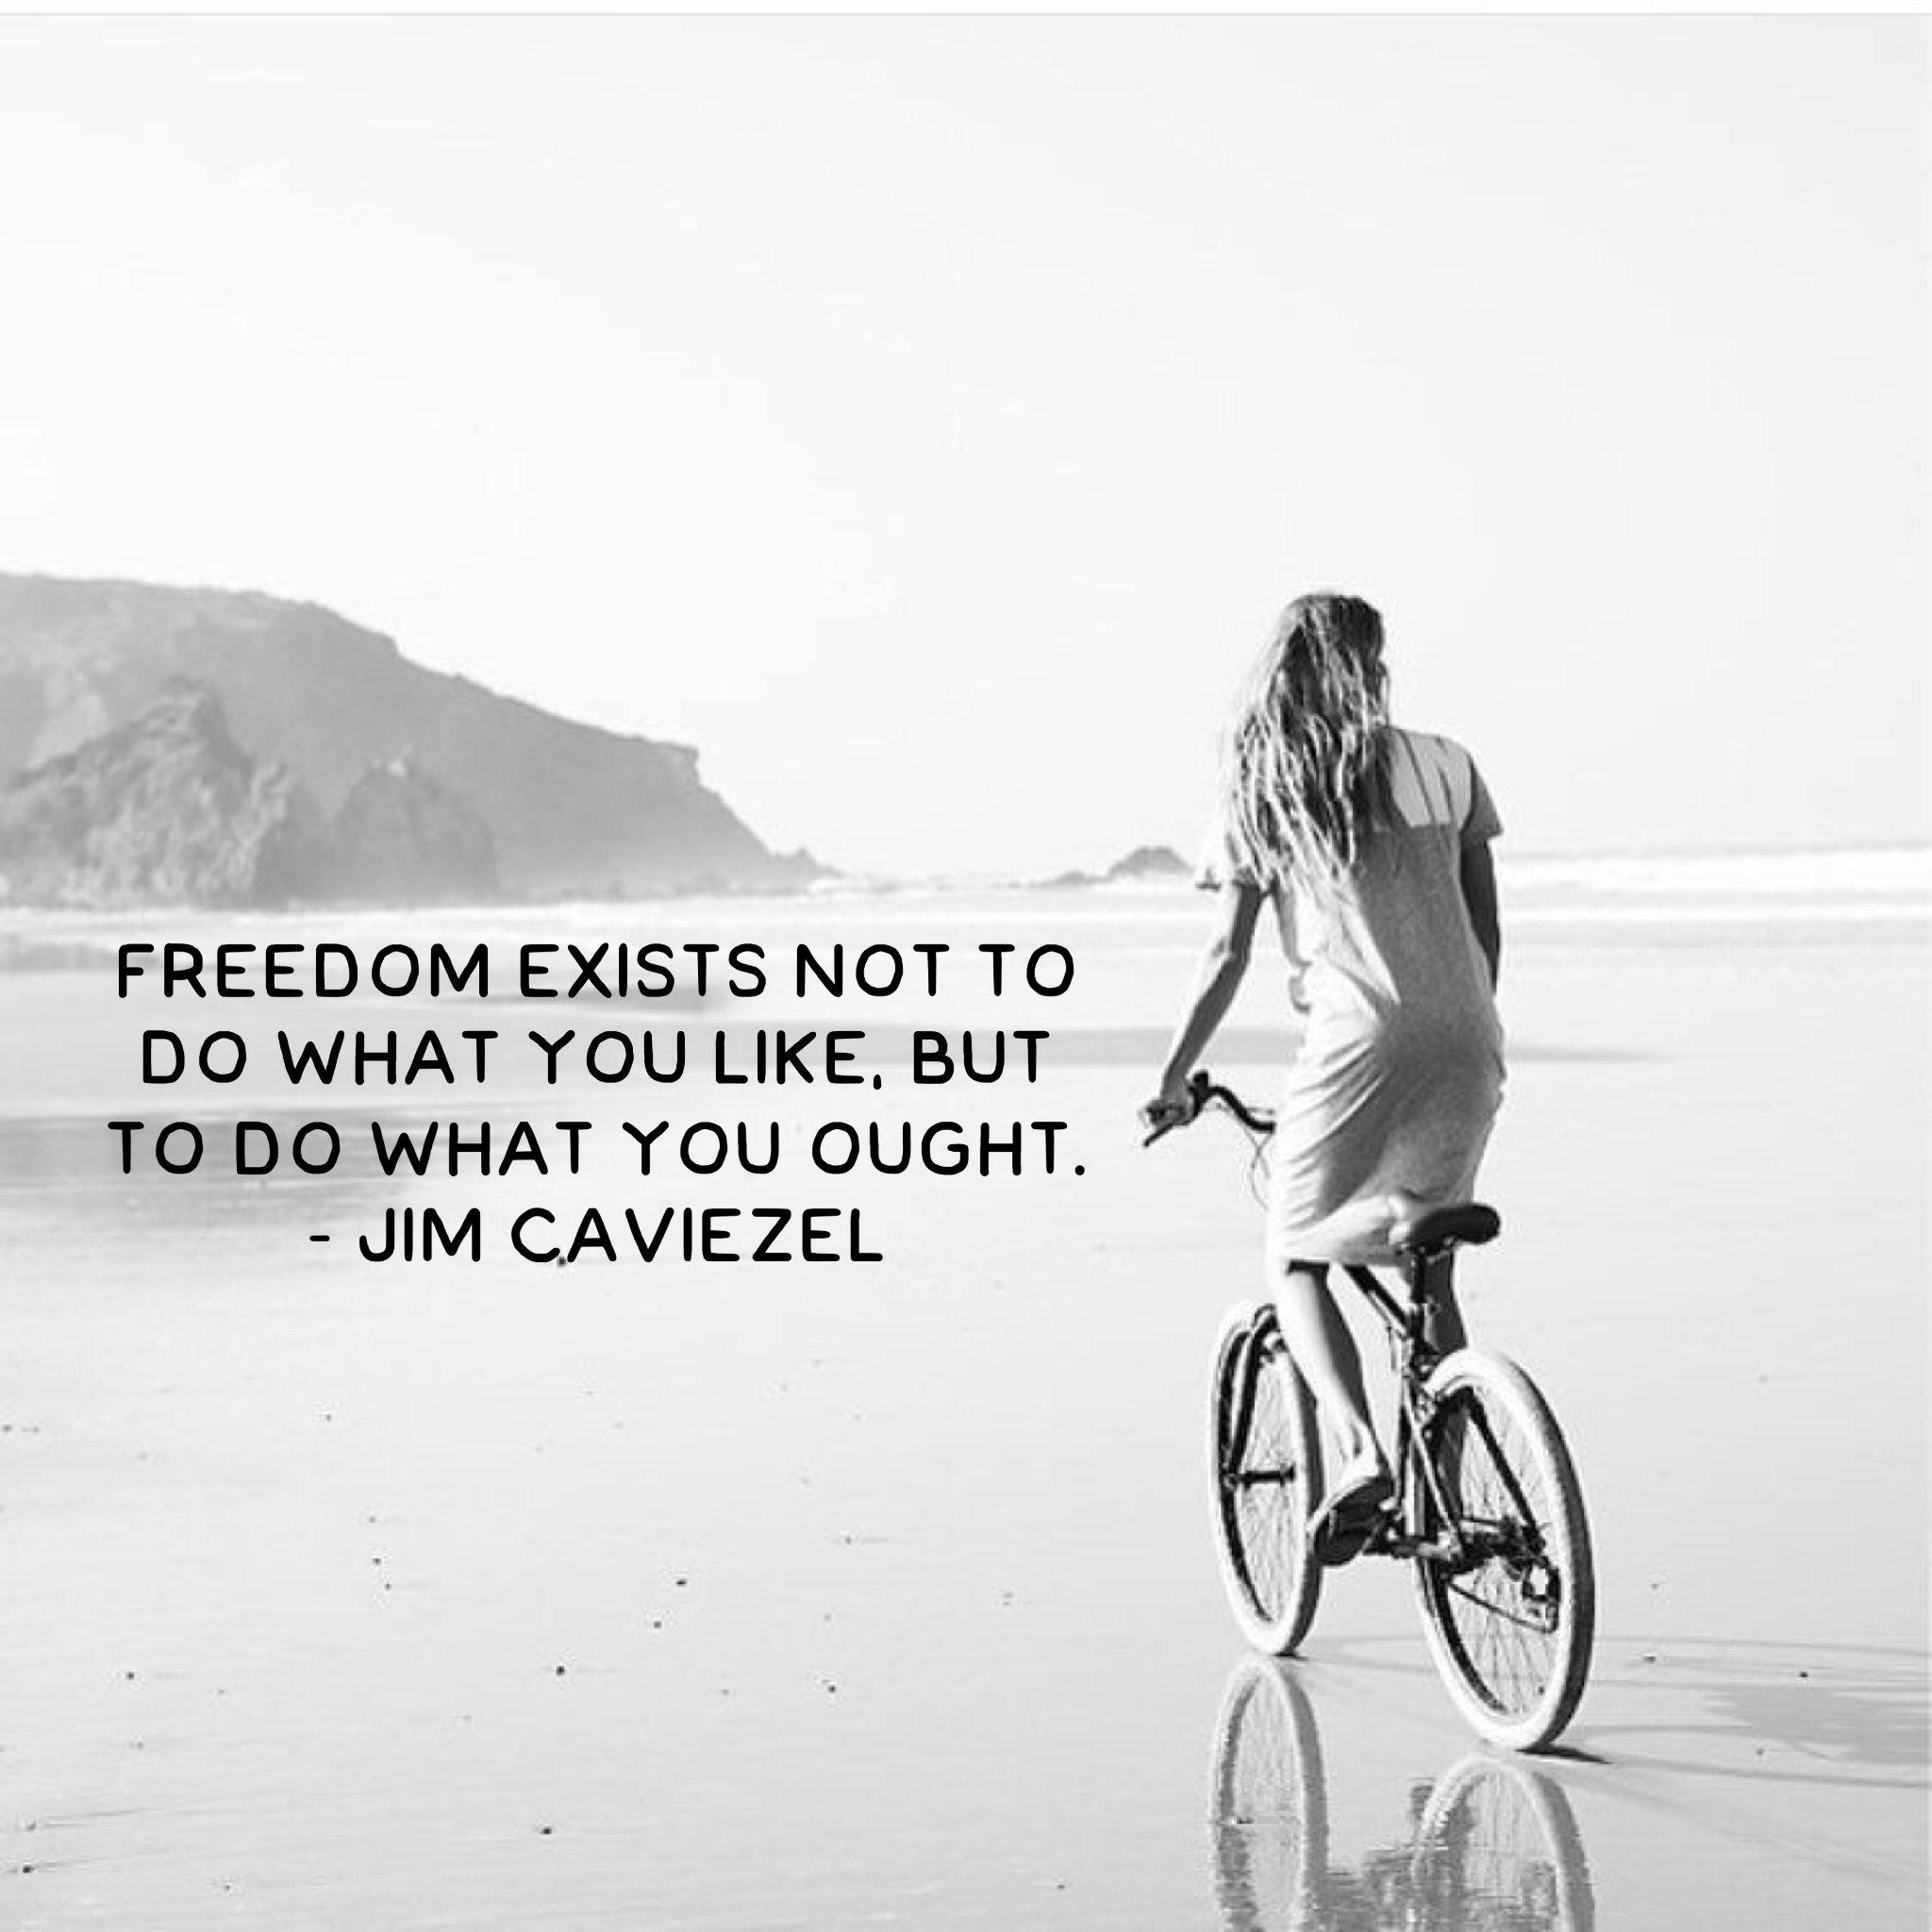 Created 17.4.17 Jim Caviezel Jim caviezel, Do what you